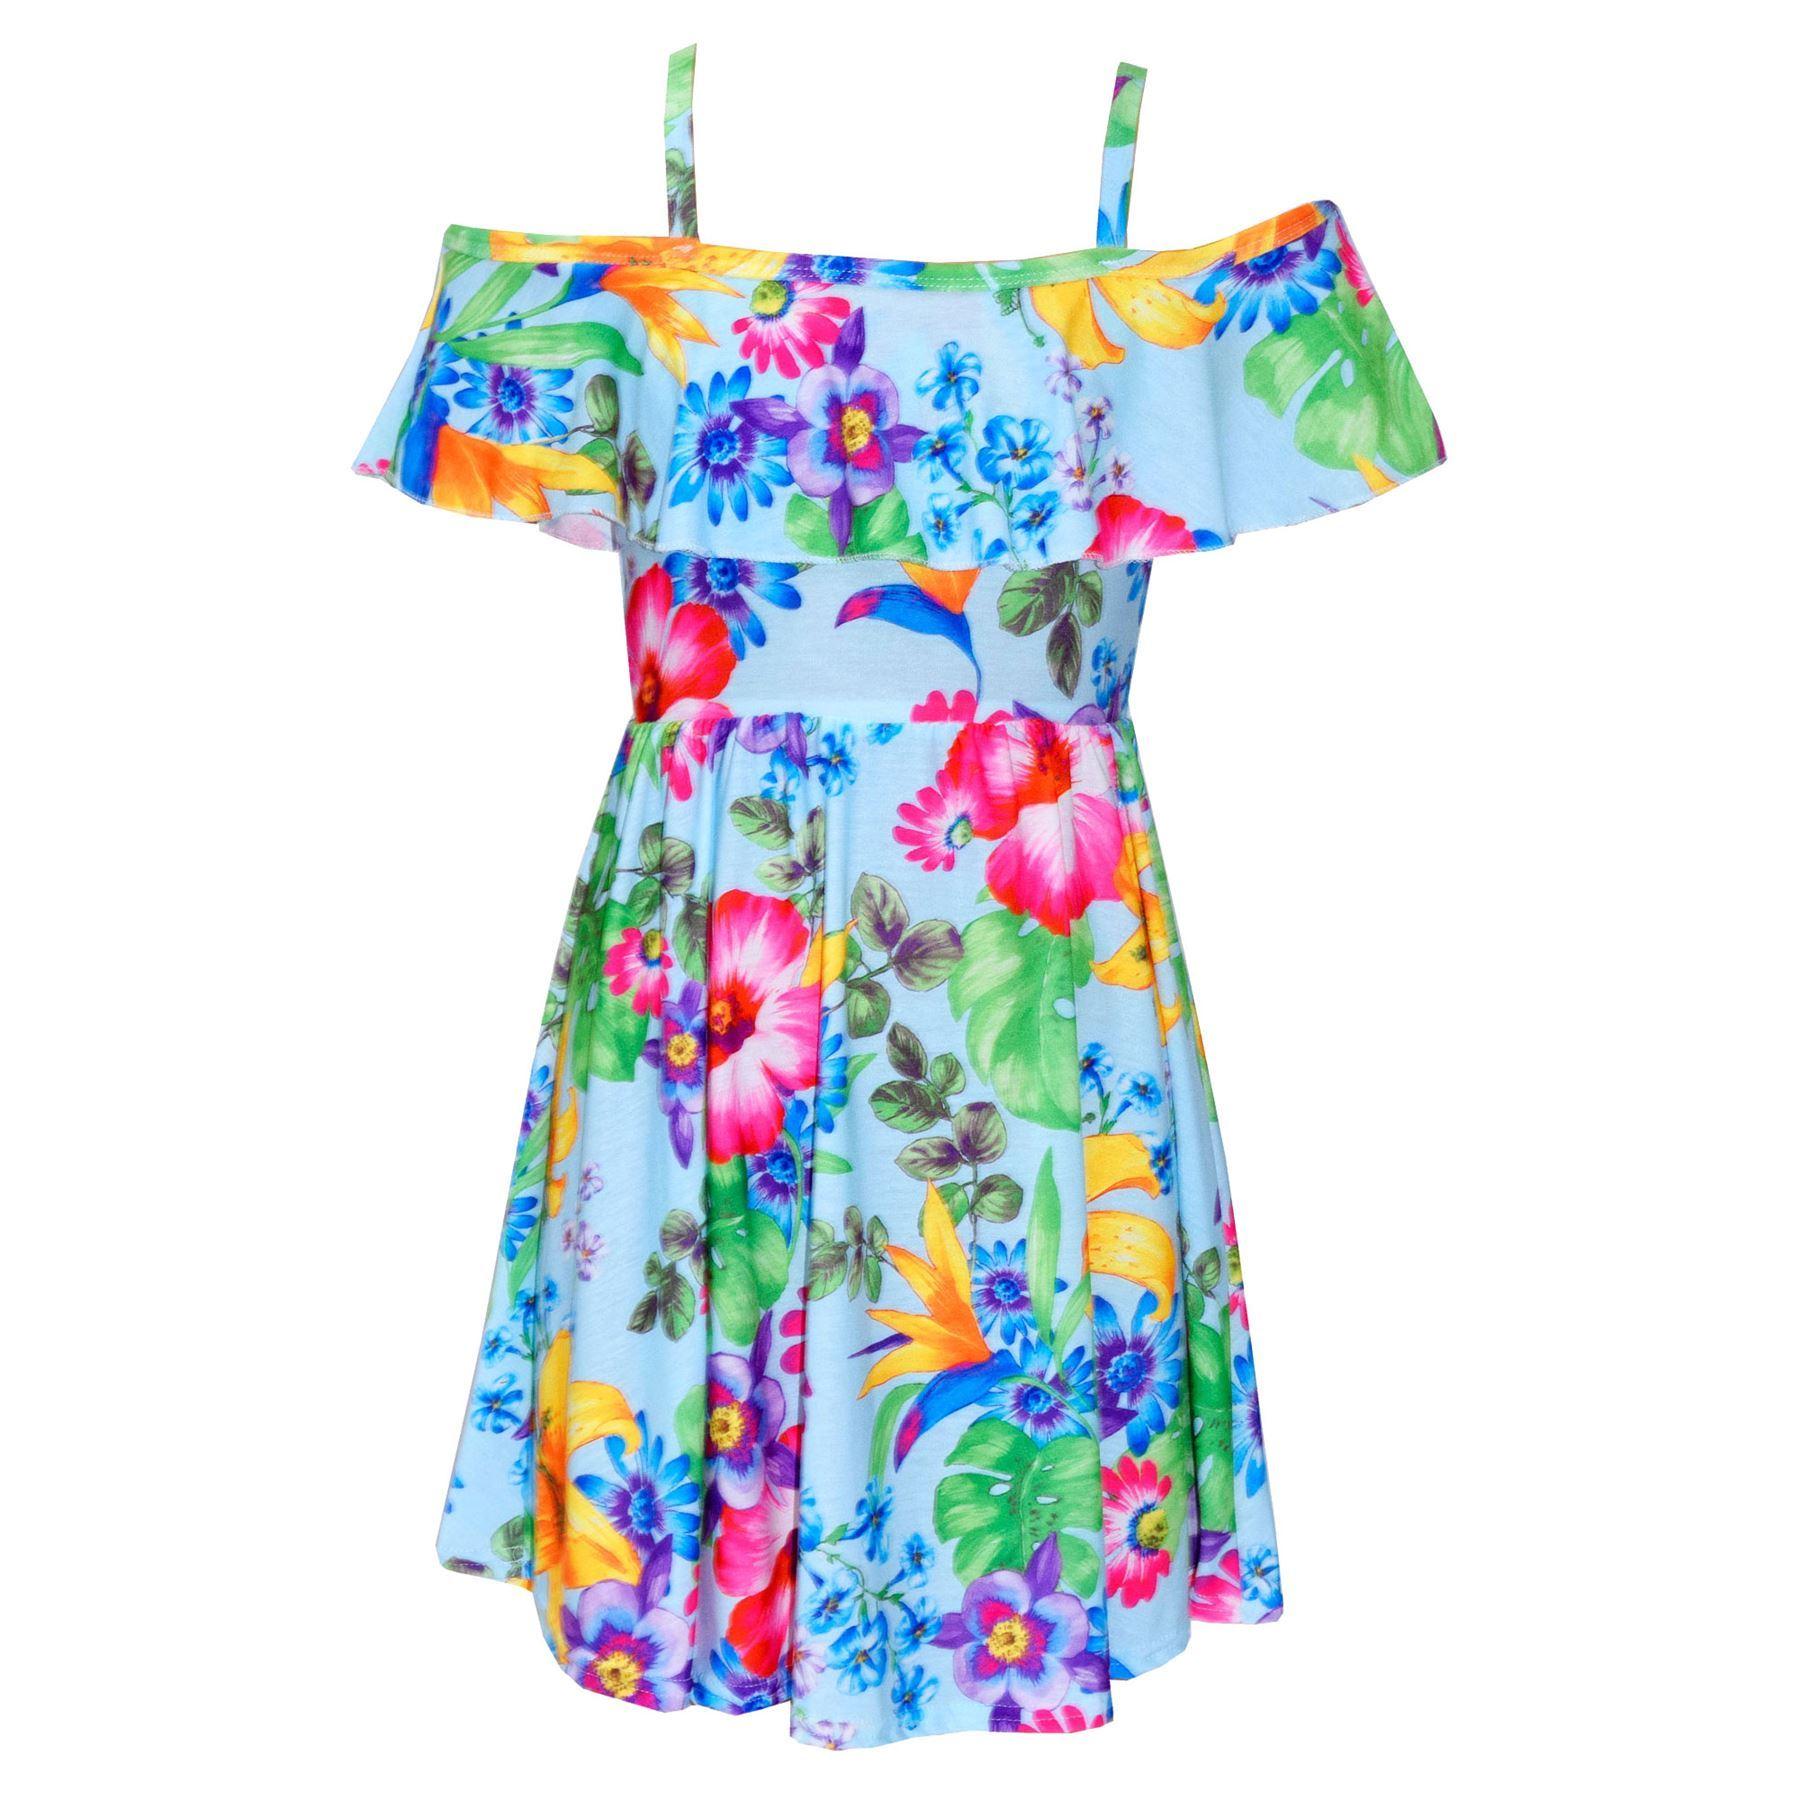 Kids Girls Skater Dress Floral Print Summer Party Fashion ...